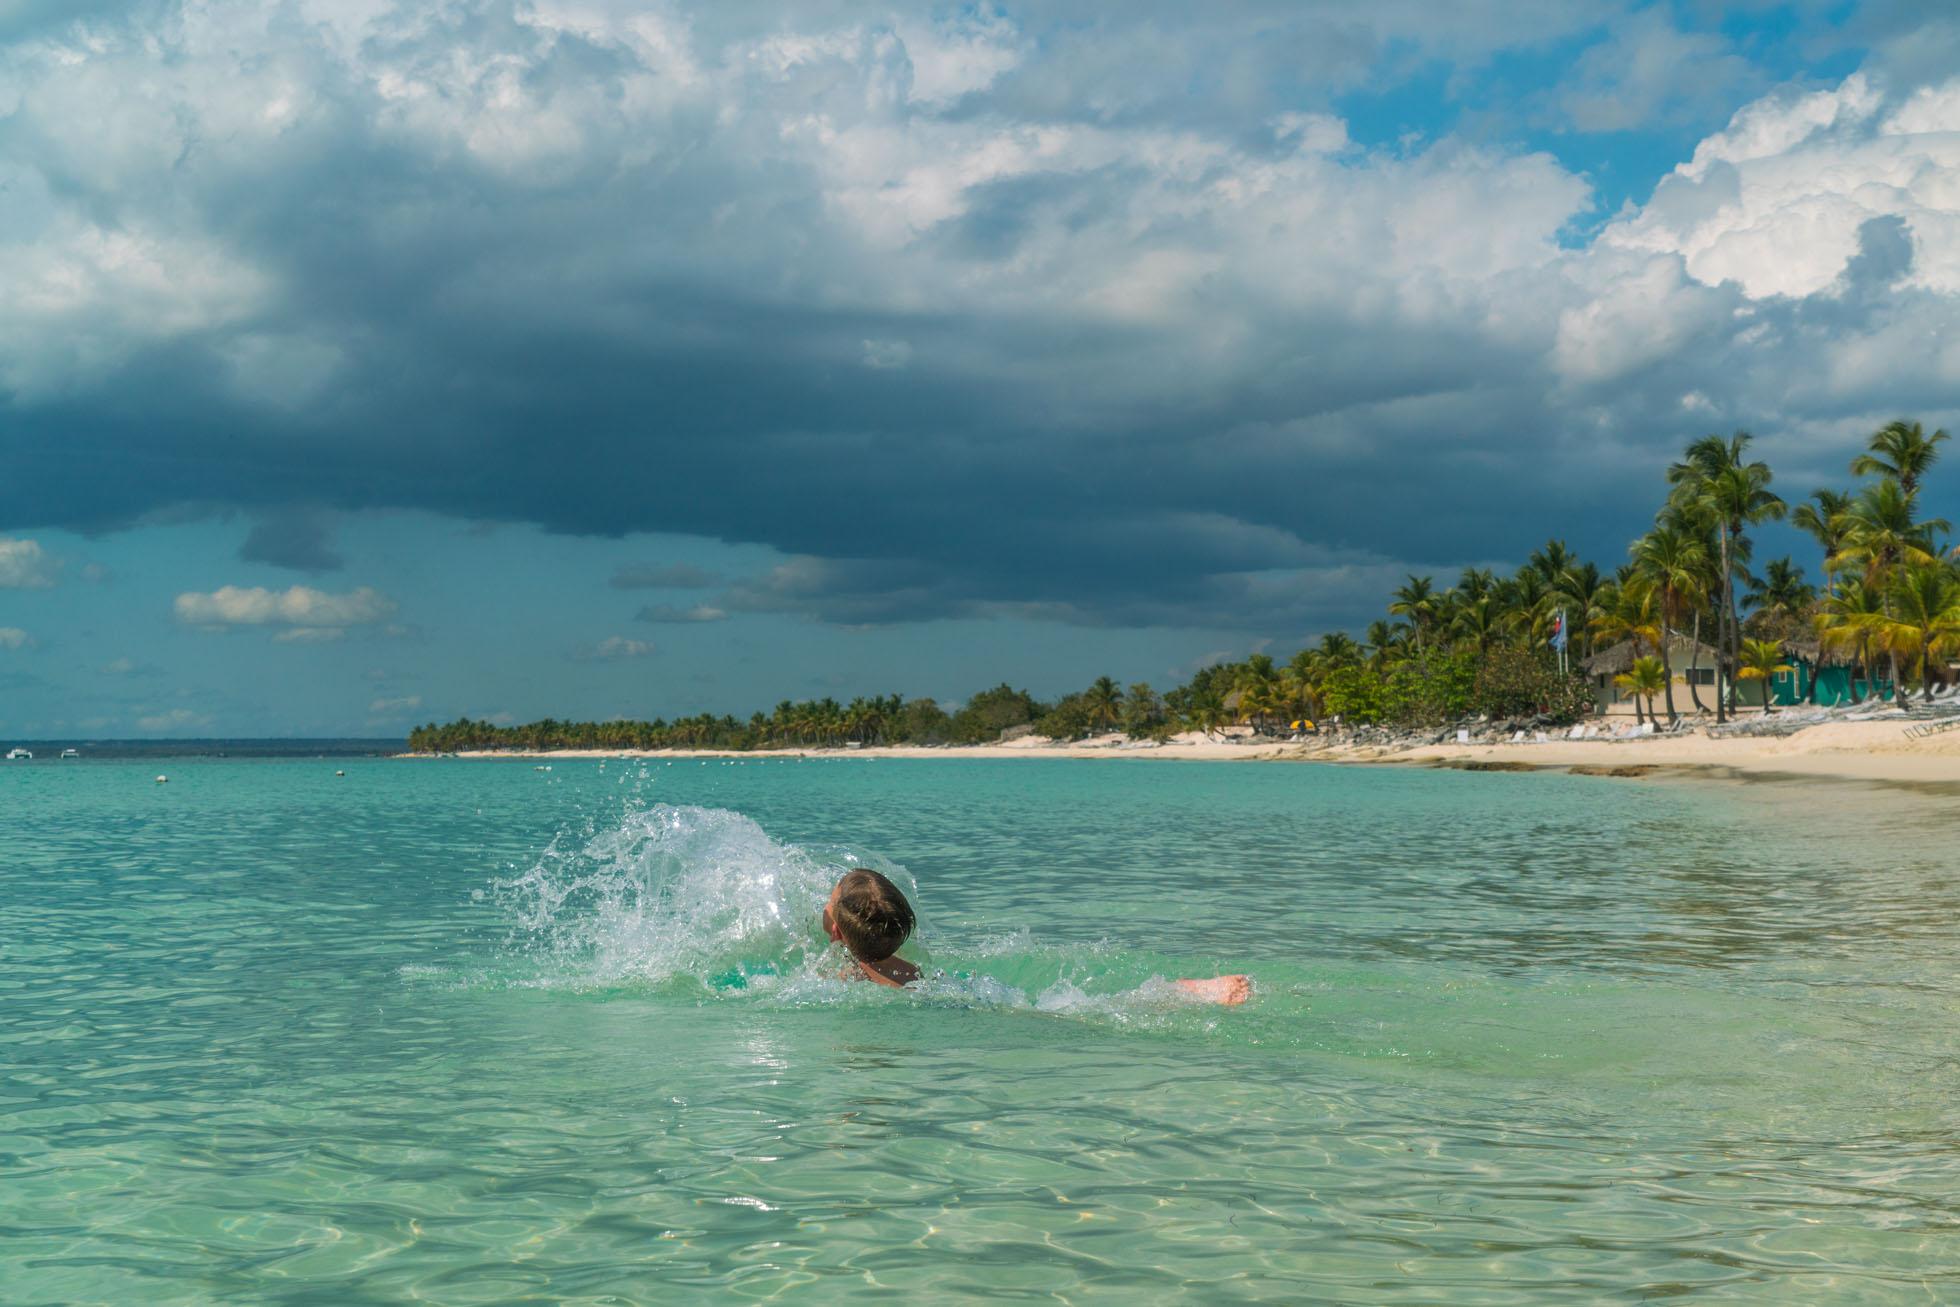 Sean swimming-2.jpg